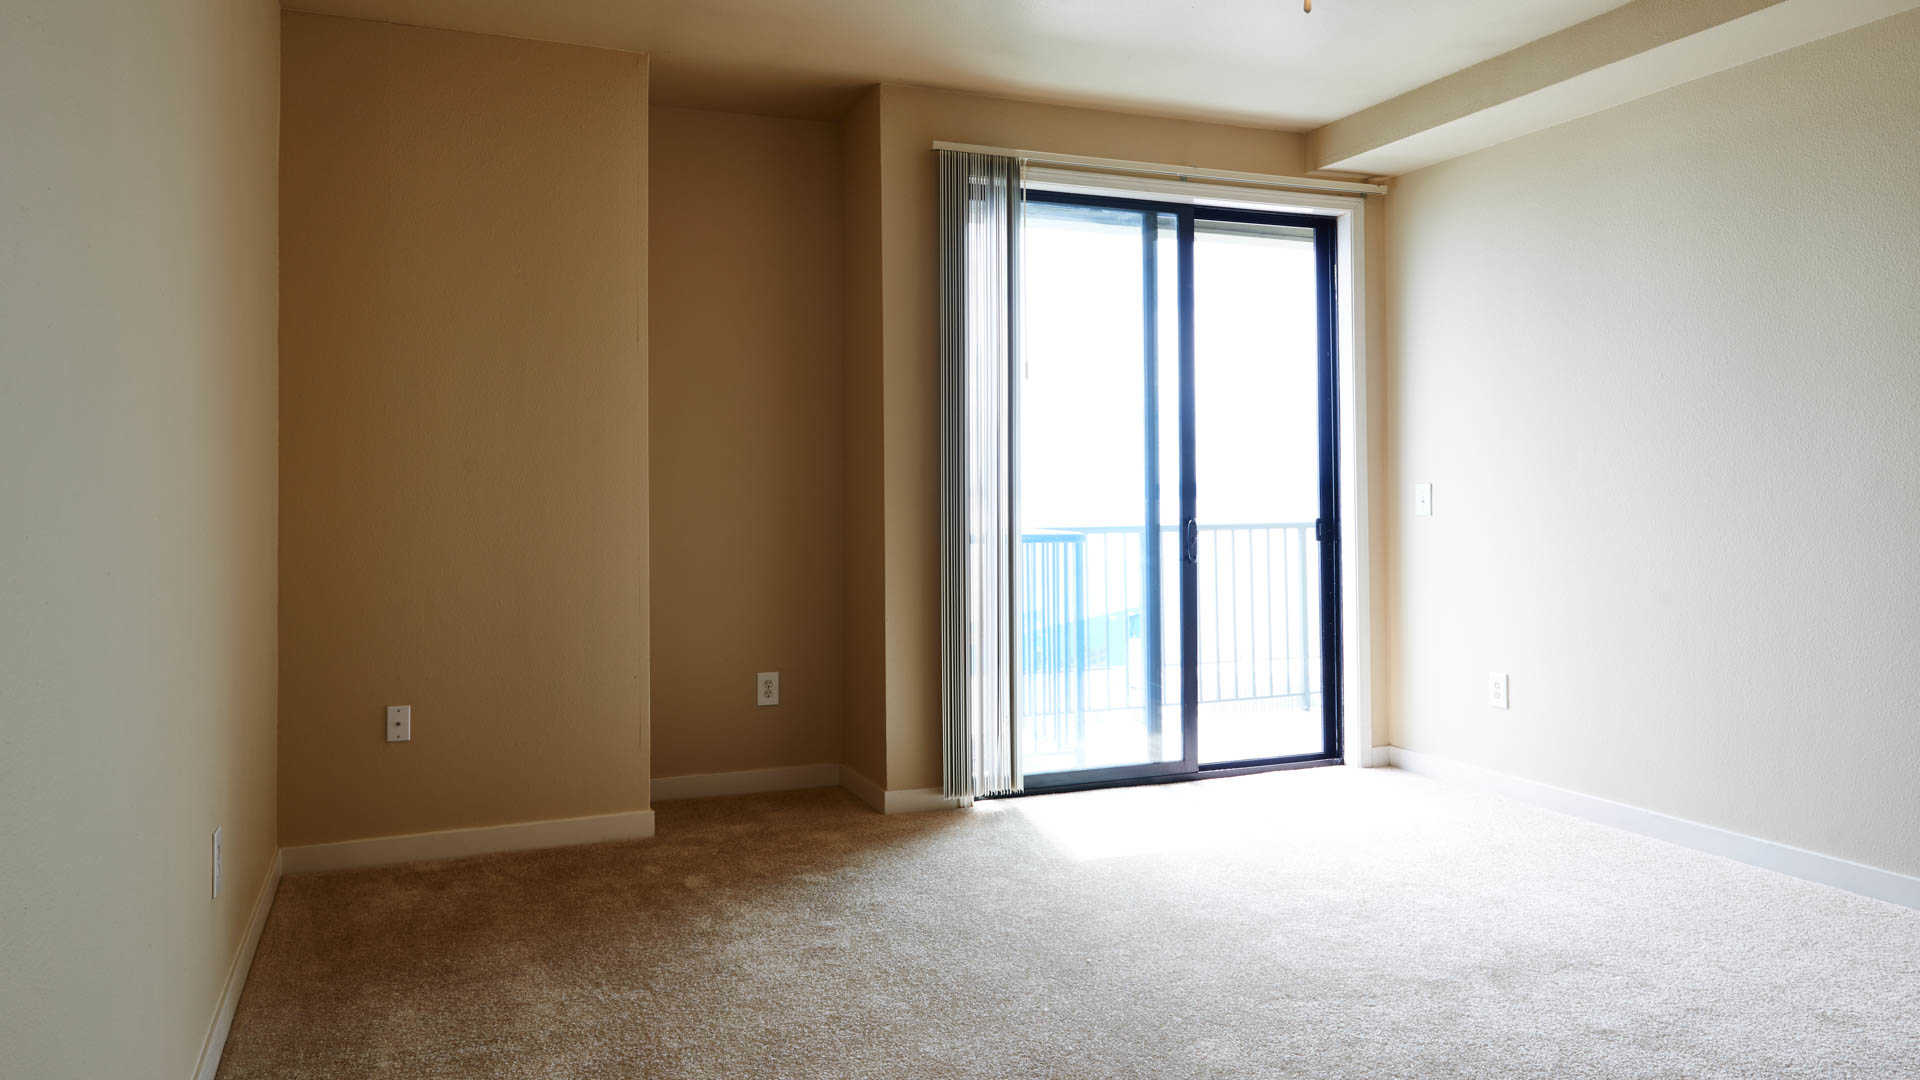 2300 Elliott Apartments reviews in Belltown - 2300 Elliott Avenue ...